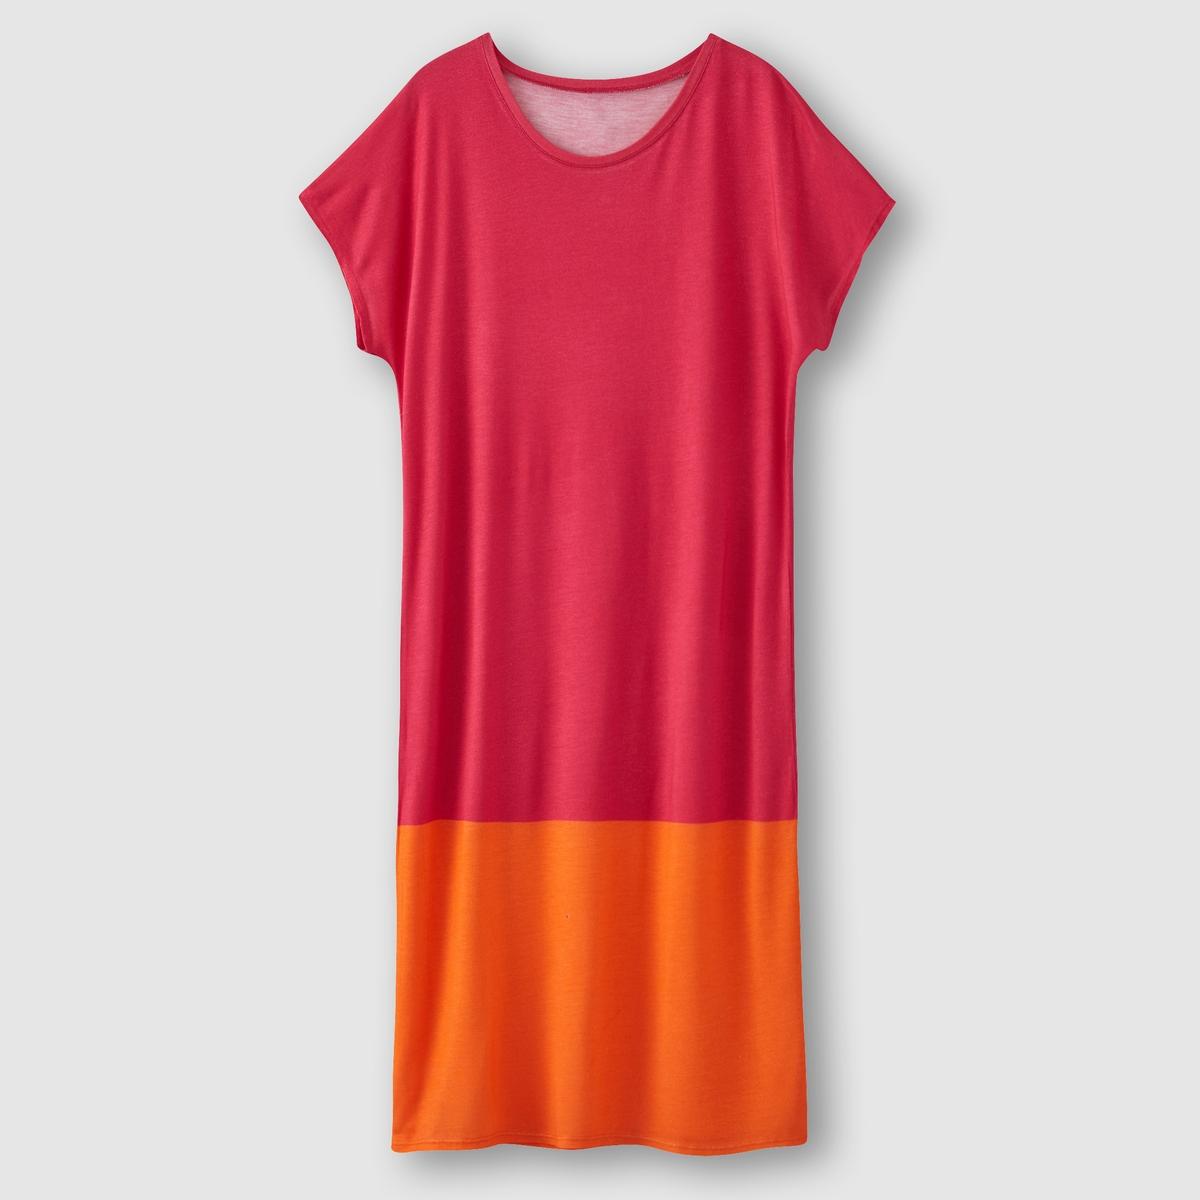 Платье с короткими рукавами R essentiel от La Redoute